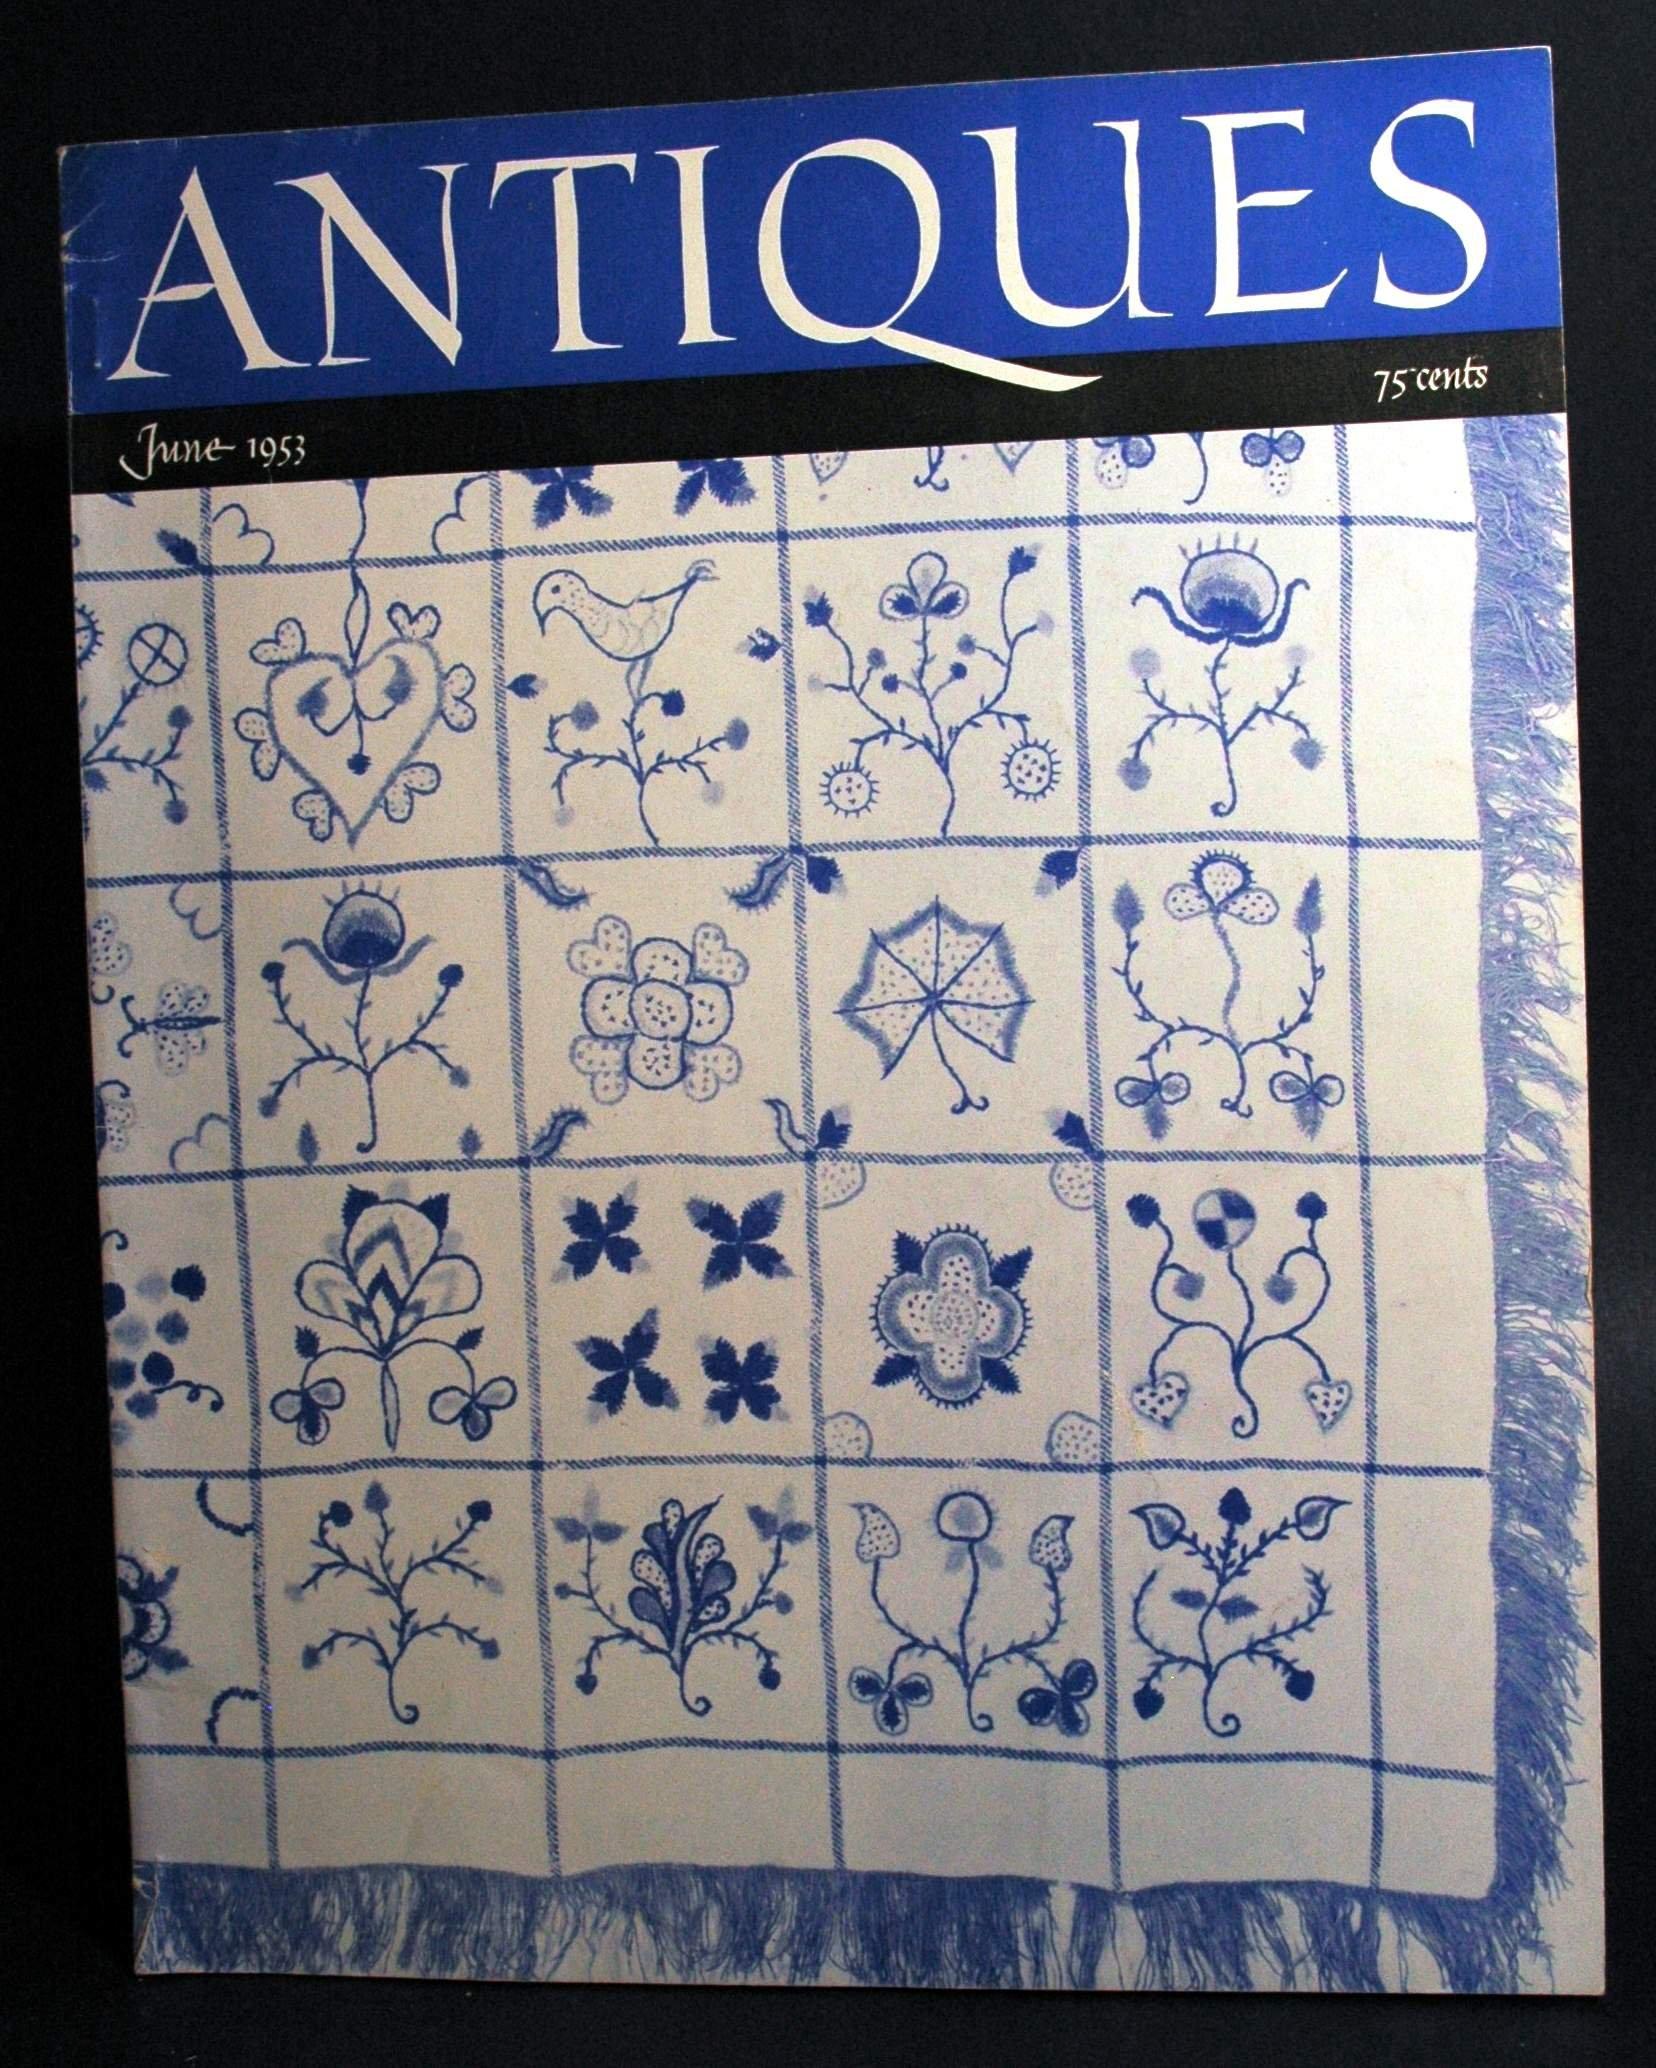 The Magazine Antiques (June 1953)